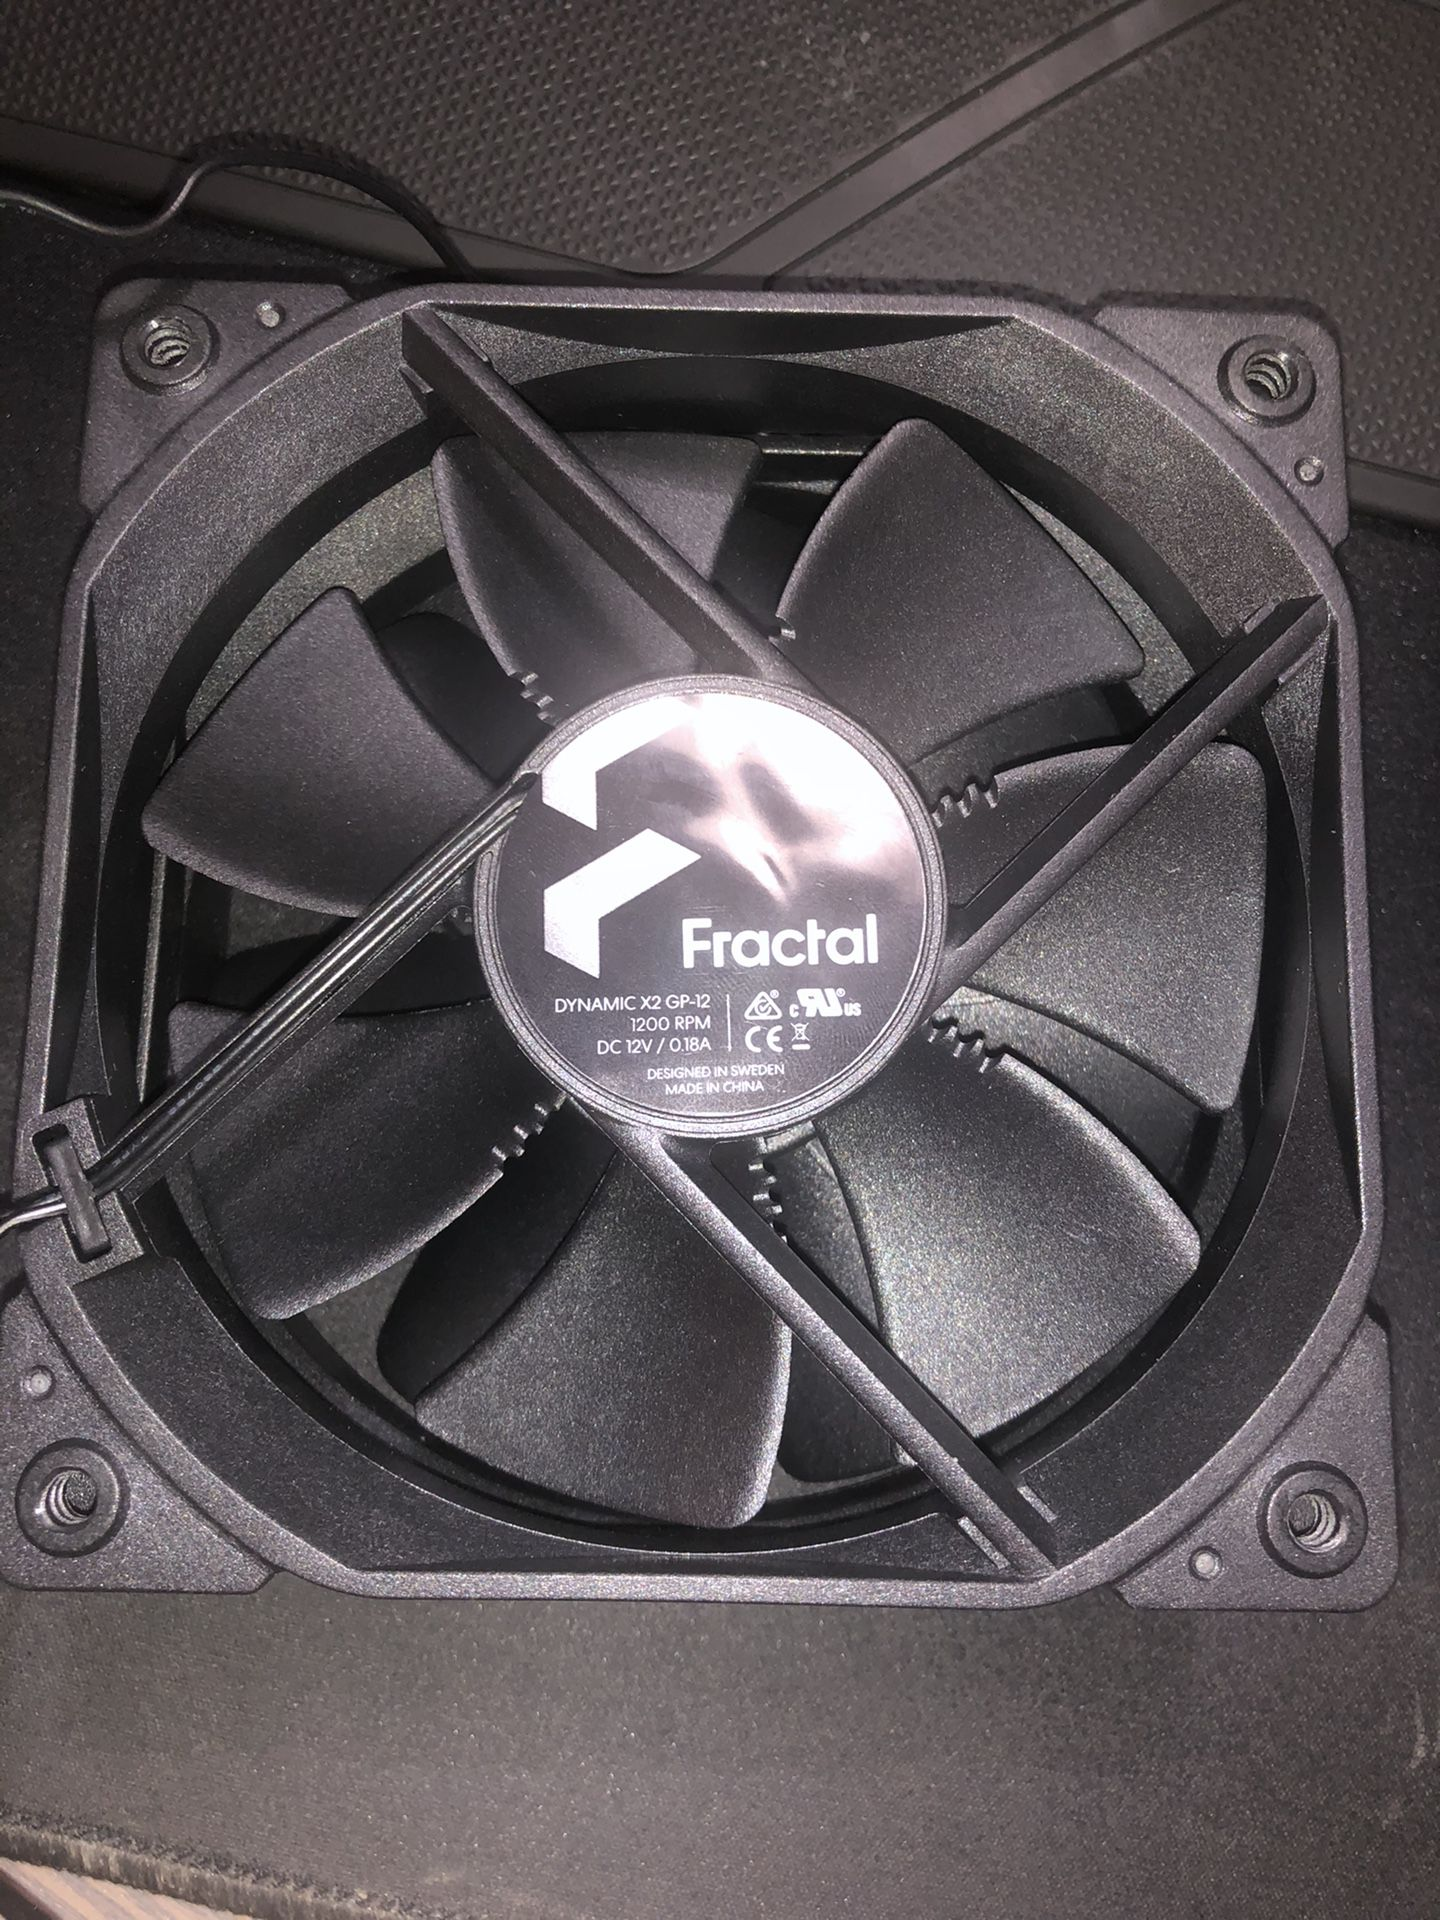 Fractal Design Dynamic X2 GP-12 (120mm 2x Stock Fans)